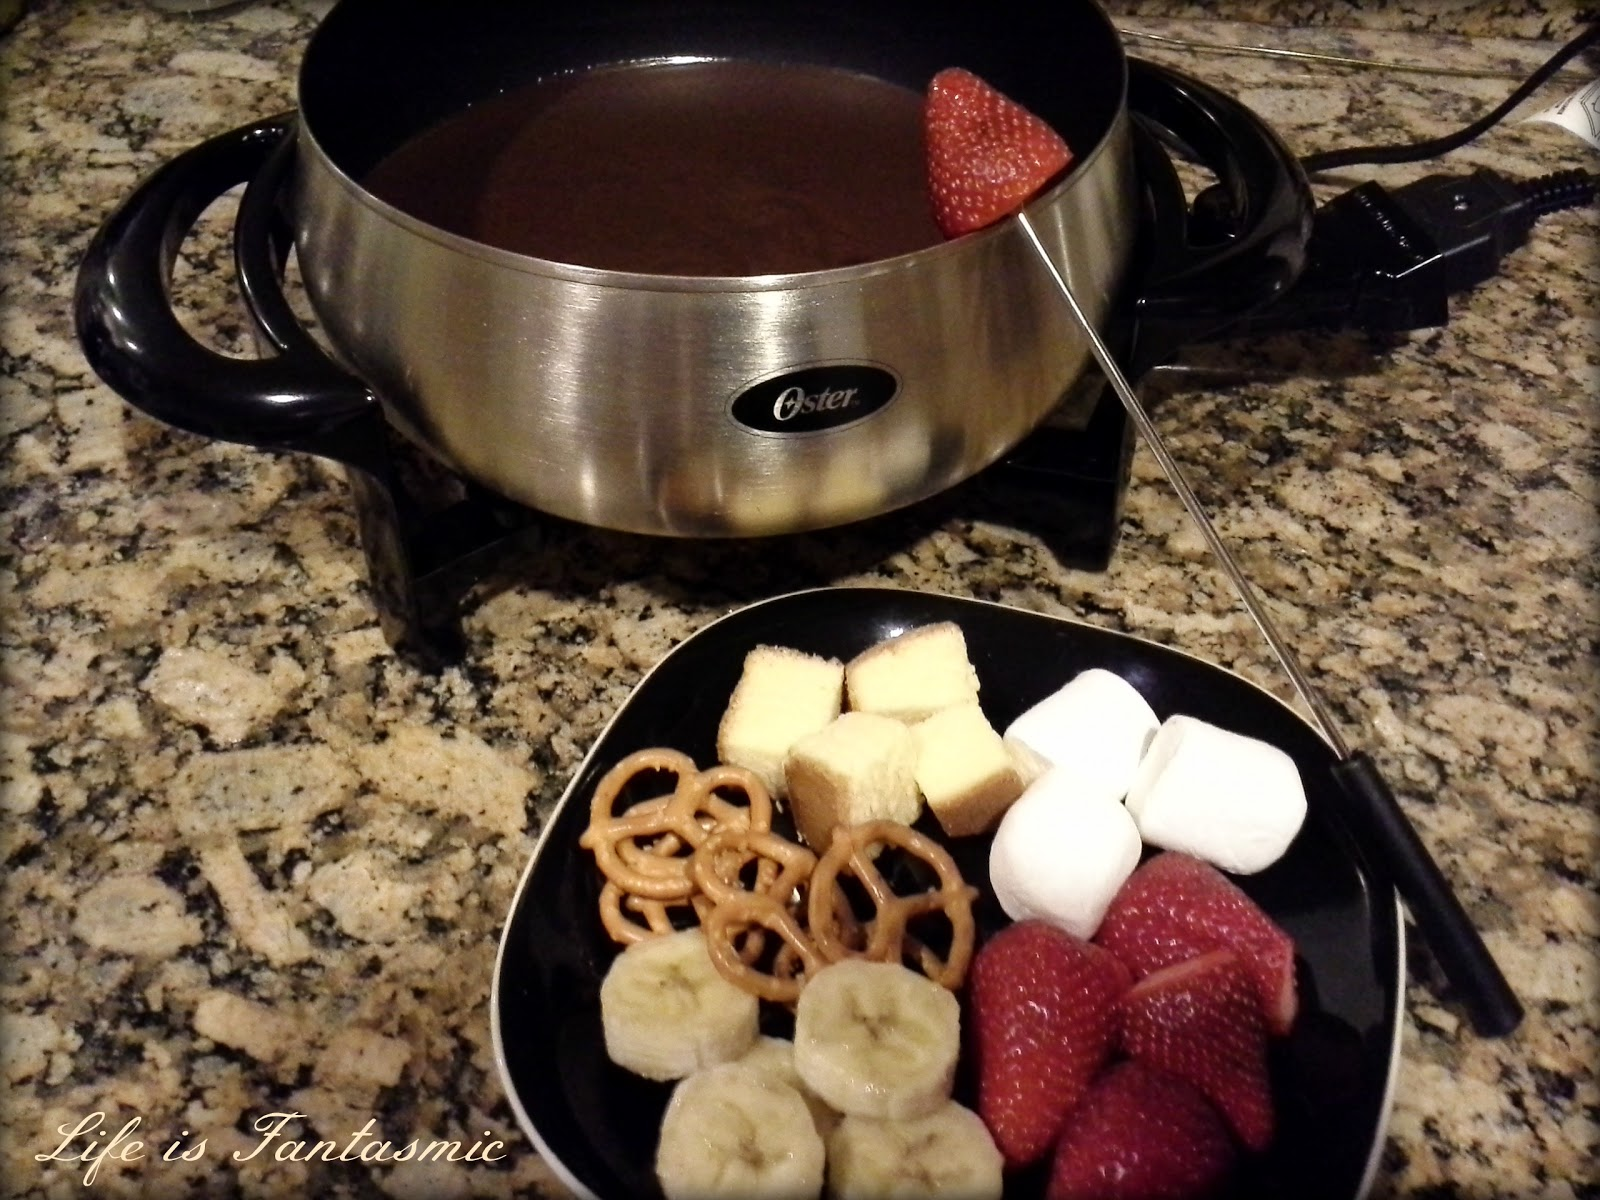 Life Is Fantasmic: Milk Chocolate Fondue